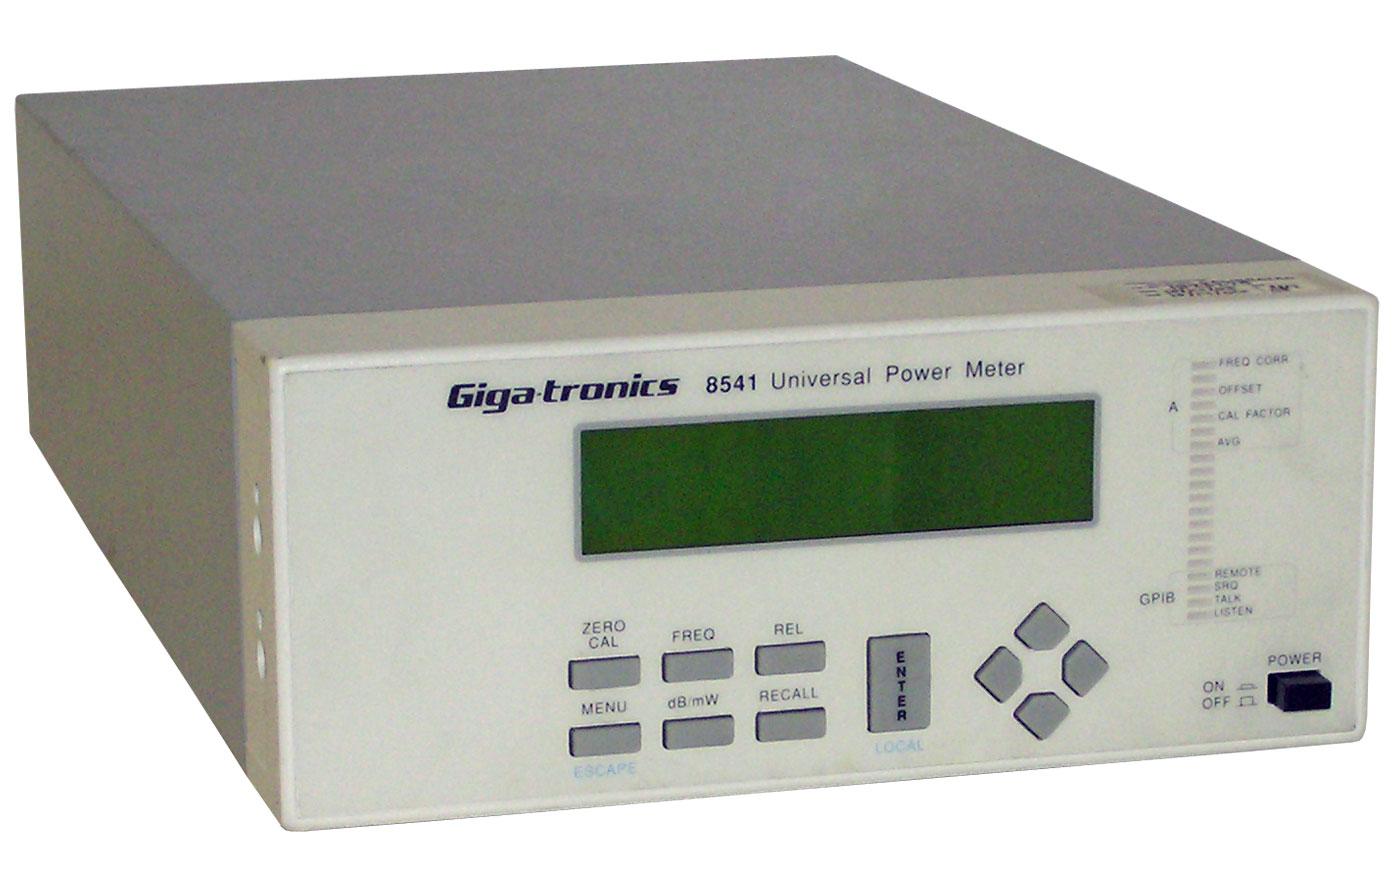 Giga Tronics Test Equipment Rentals Atec Gt Circuit Breakers Transformers 8541 Universal Power Meter